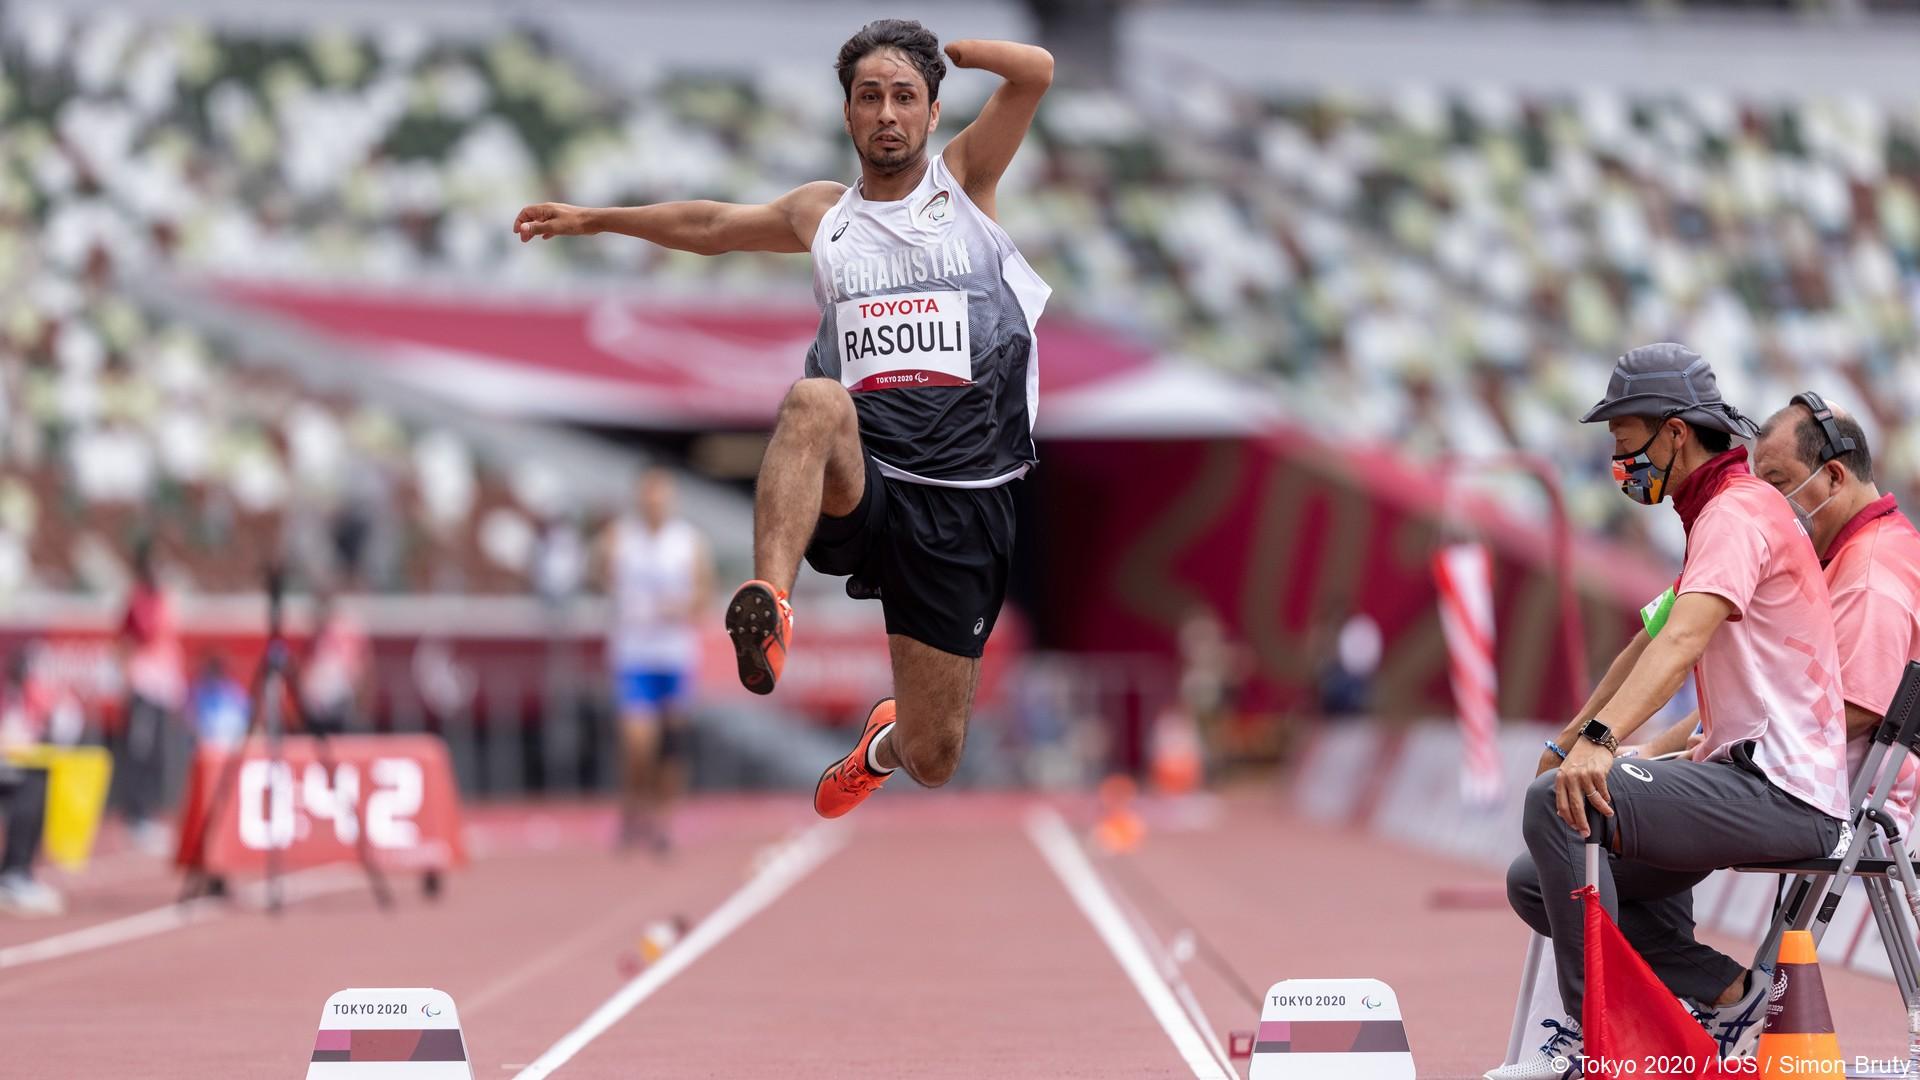 Tokyo 2020 – Paralympiques (13) Hossein Rasouli Afghanistan